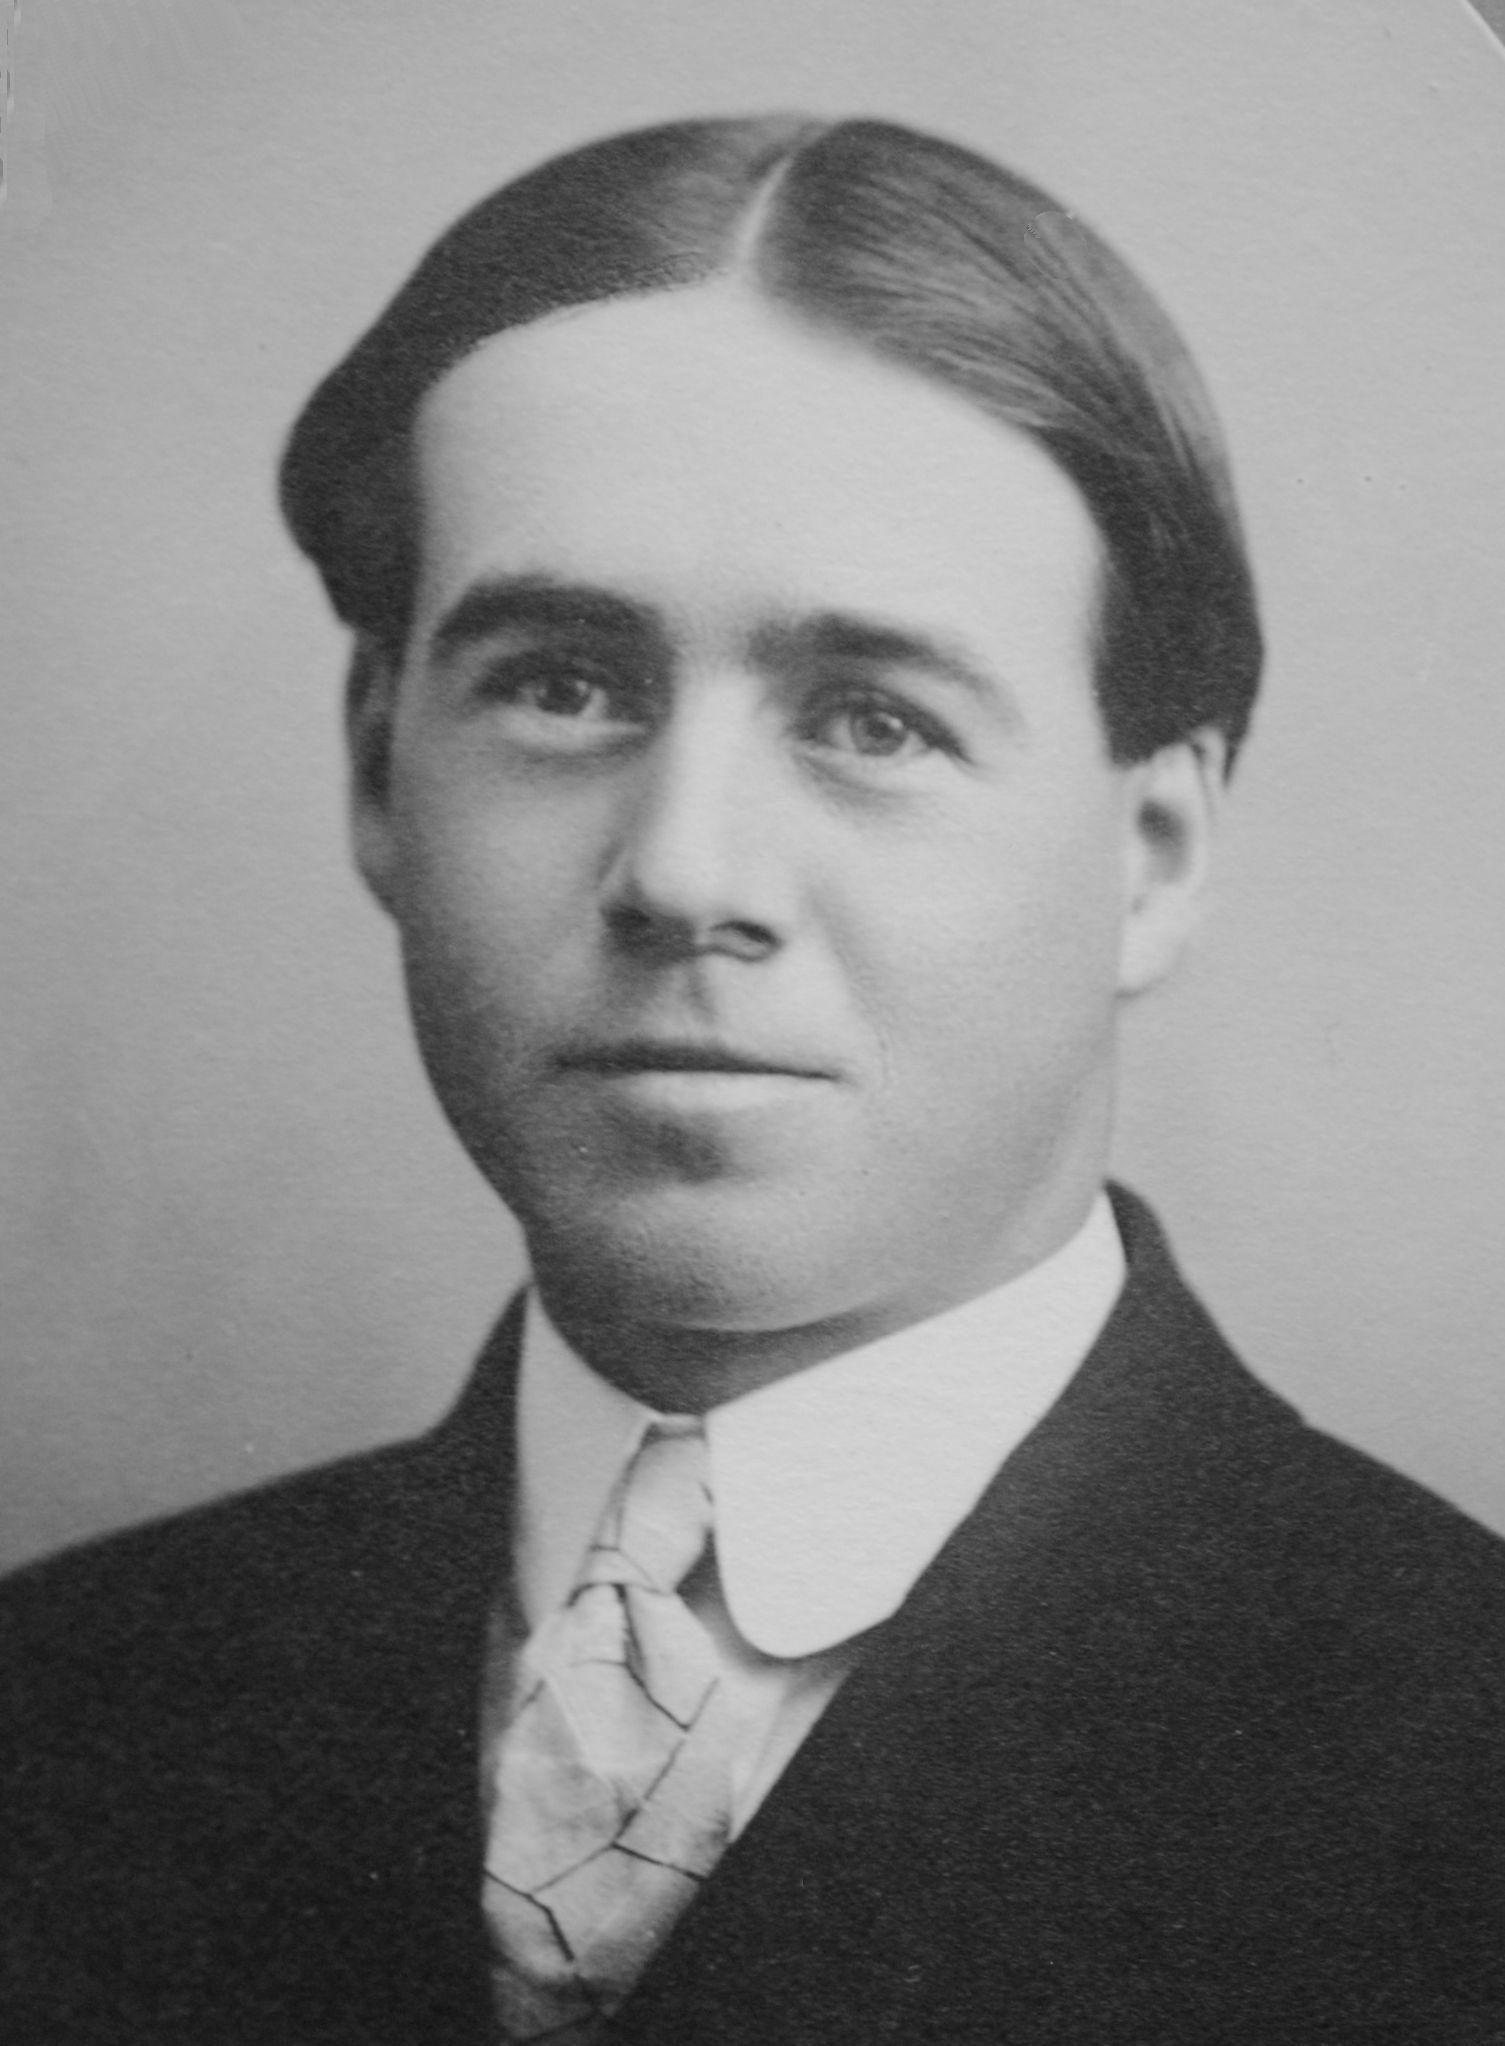 Curtis, Raymond Barker